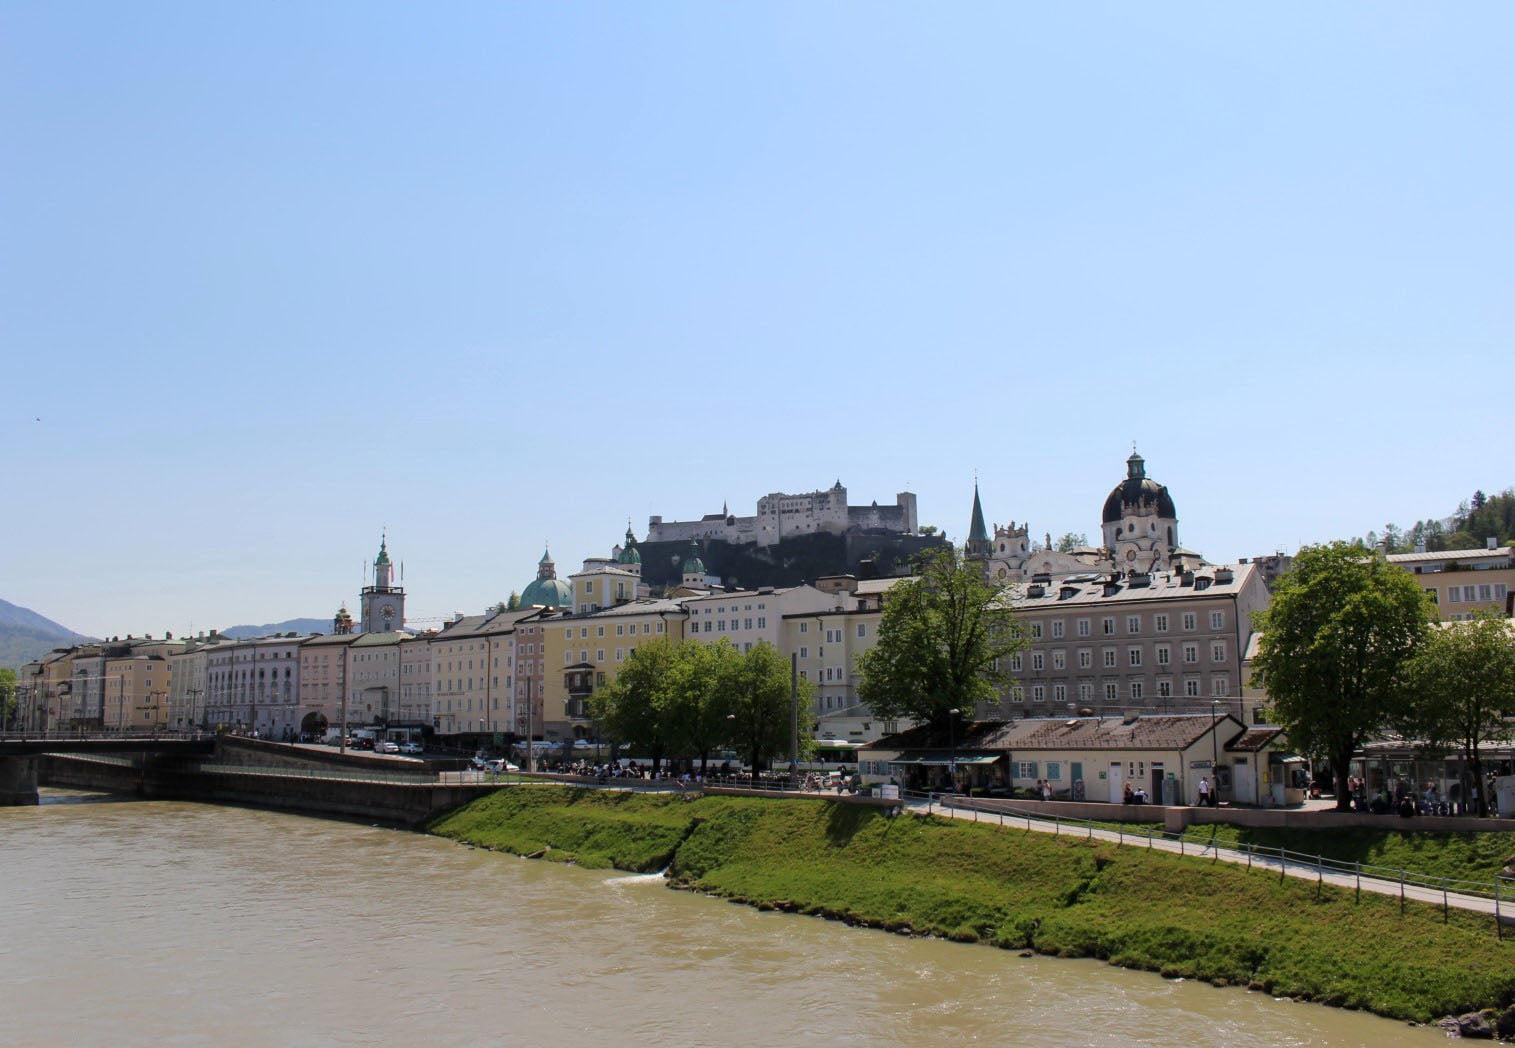 Metropole_2021_Austrija_Salzburg_putovanja_landscape_akcija